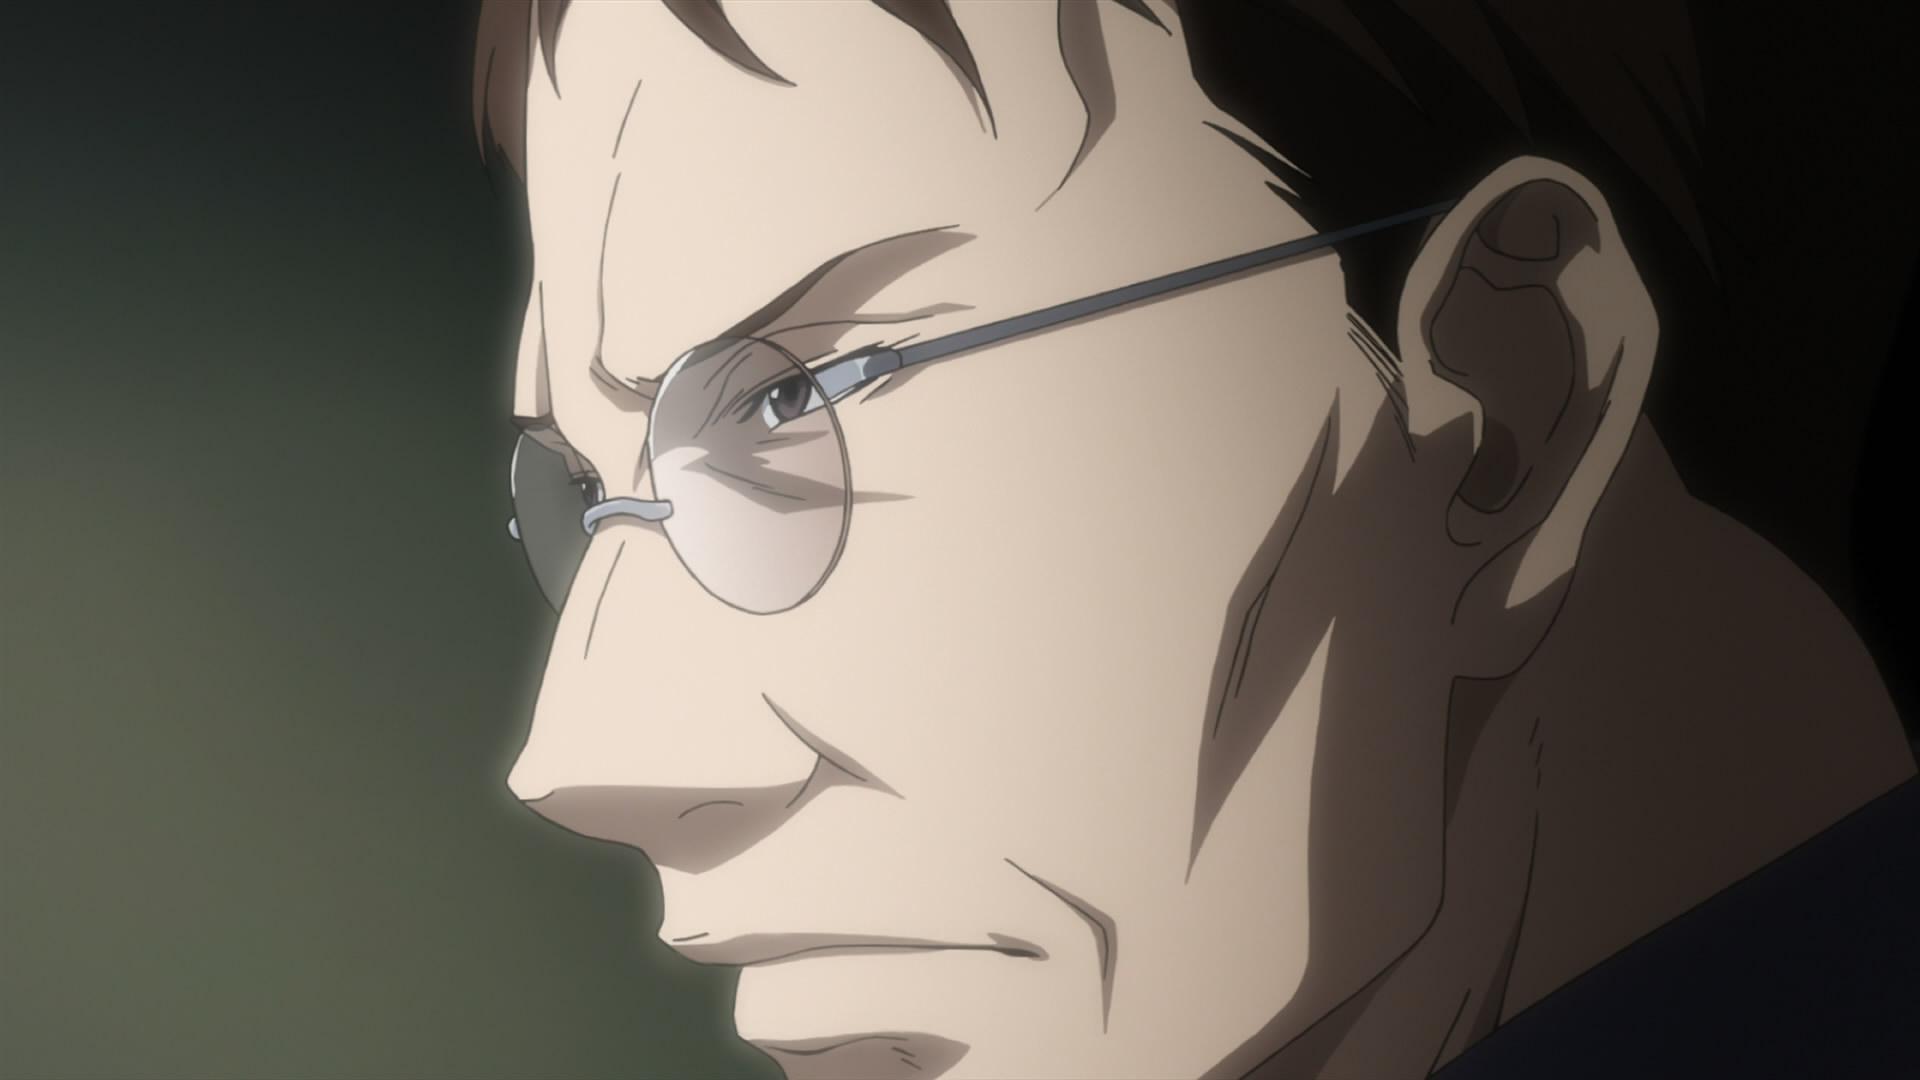 [gSS]_Mobile_Suit_Gundam_00_-_A_wakening_of_the_Trailblazer_(1080p)_[2B252856].mkv_snapshot_01.57.53_[2011.01.07_04.54.20]